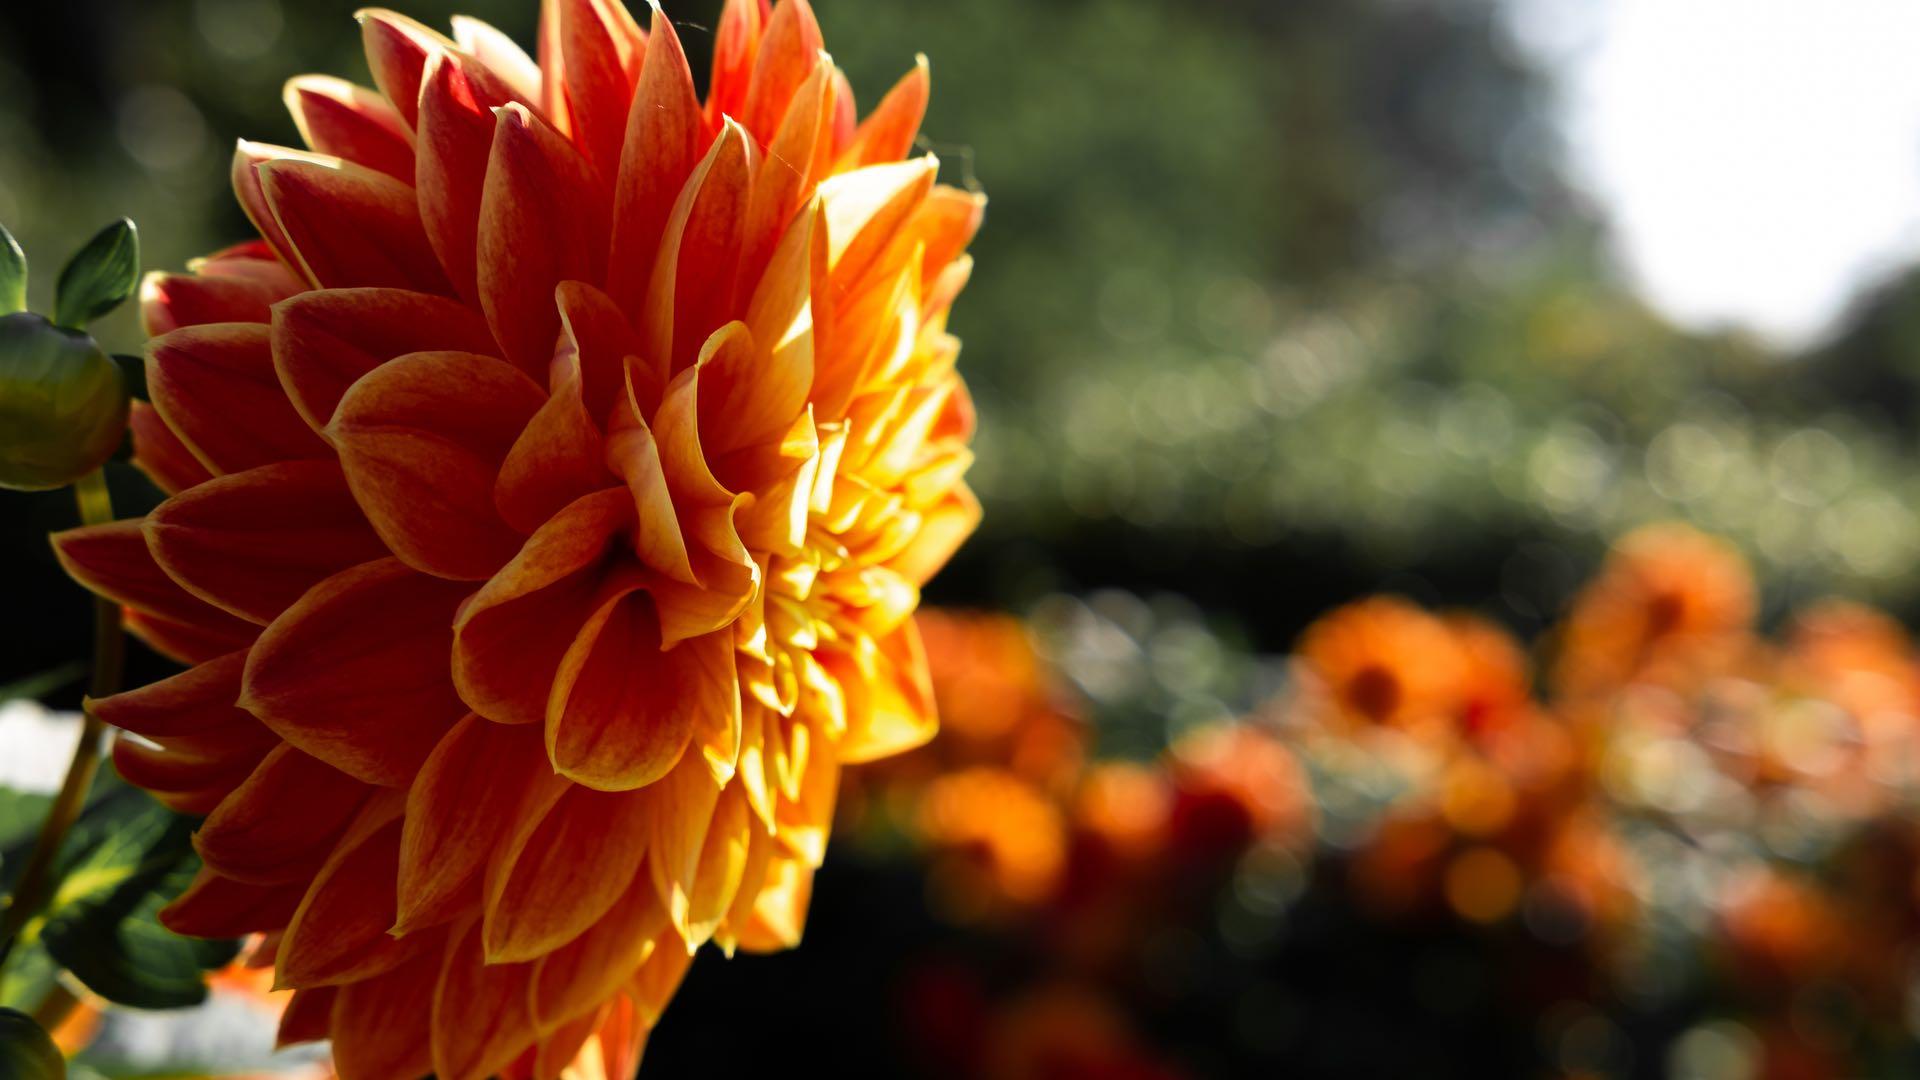 Orange Dahlia 1920x1080